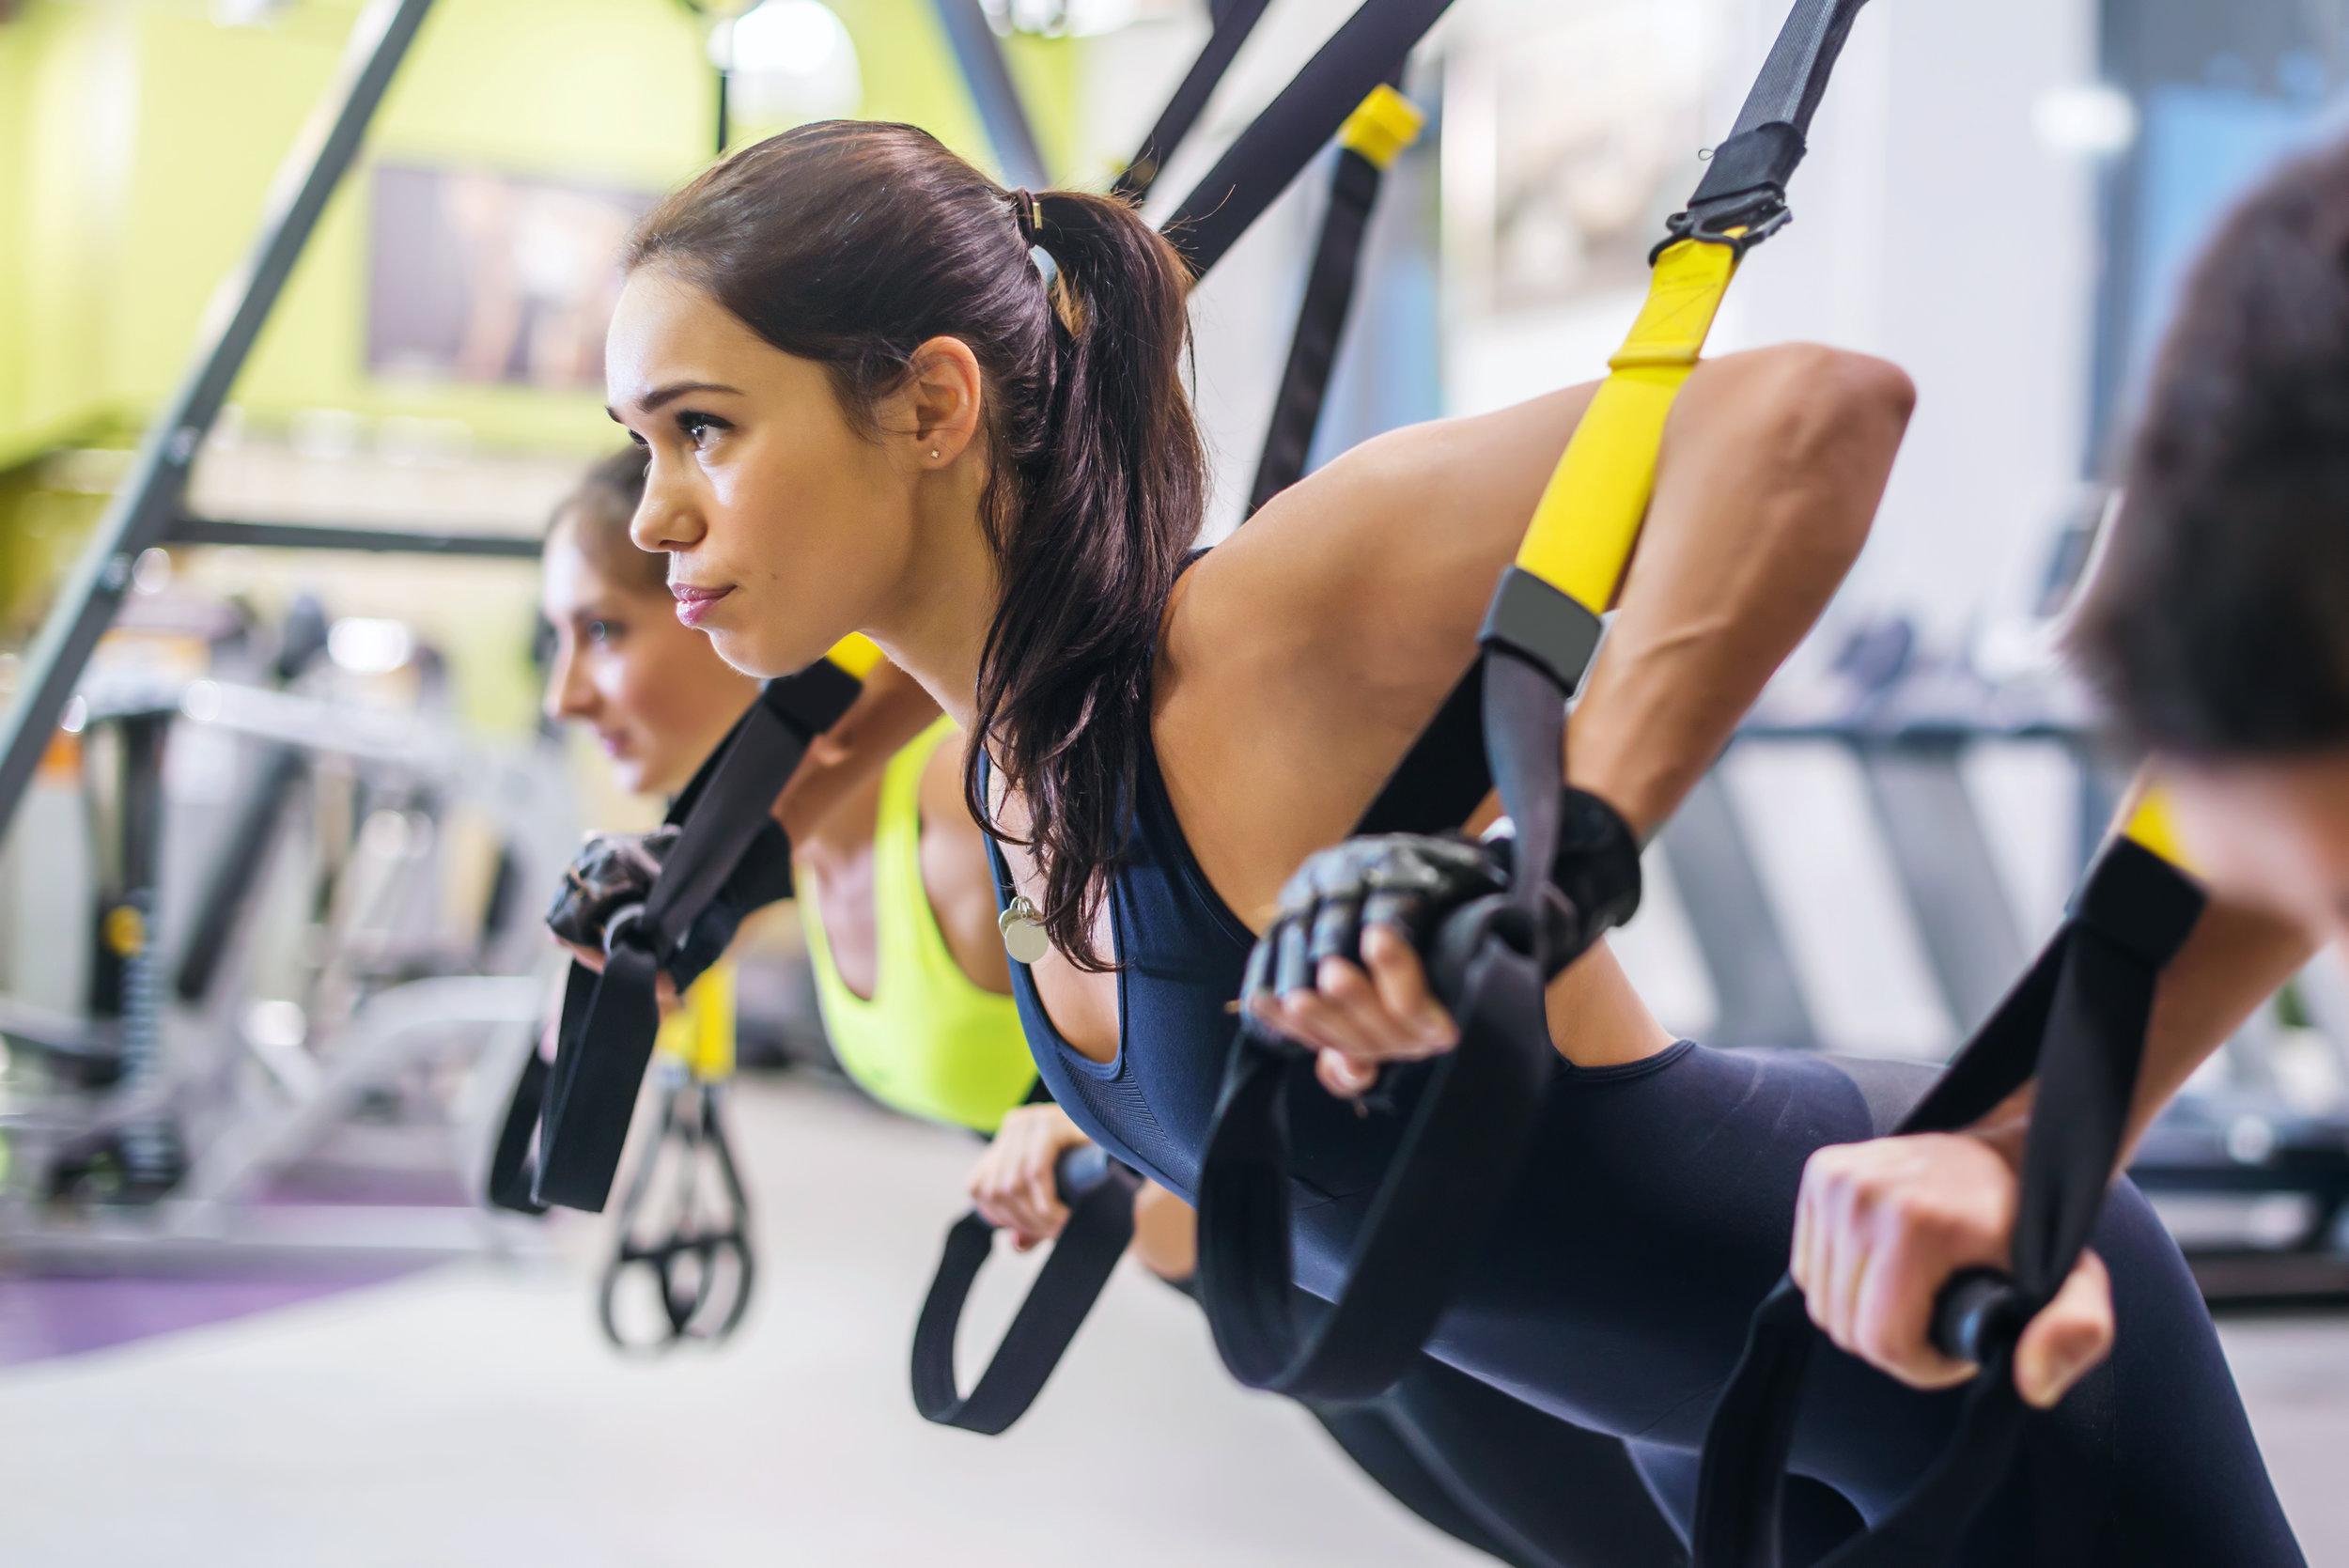 bigstock-Women-doing-push-ups-training--109099061.jpg